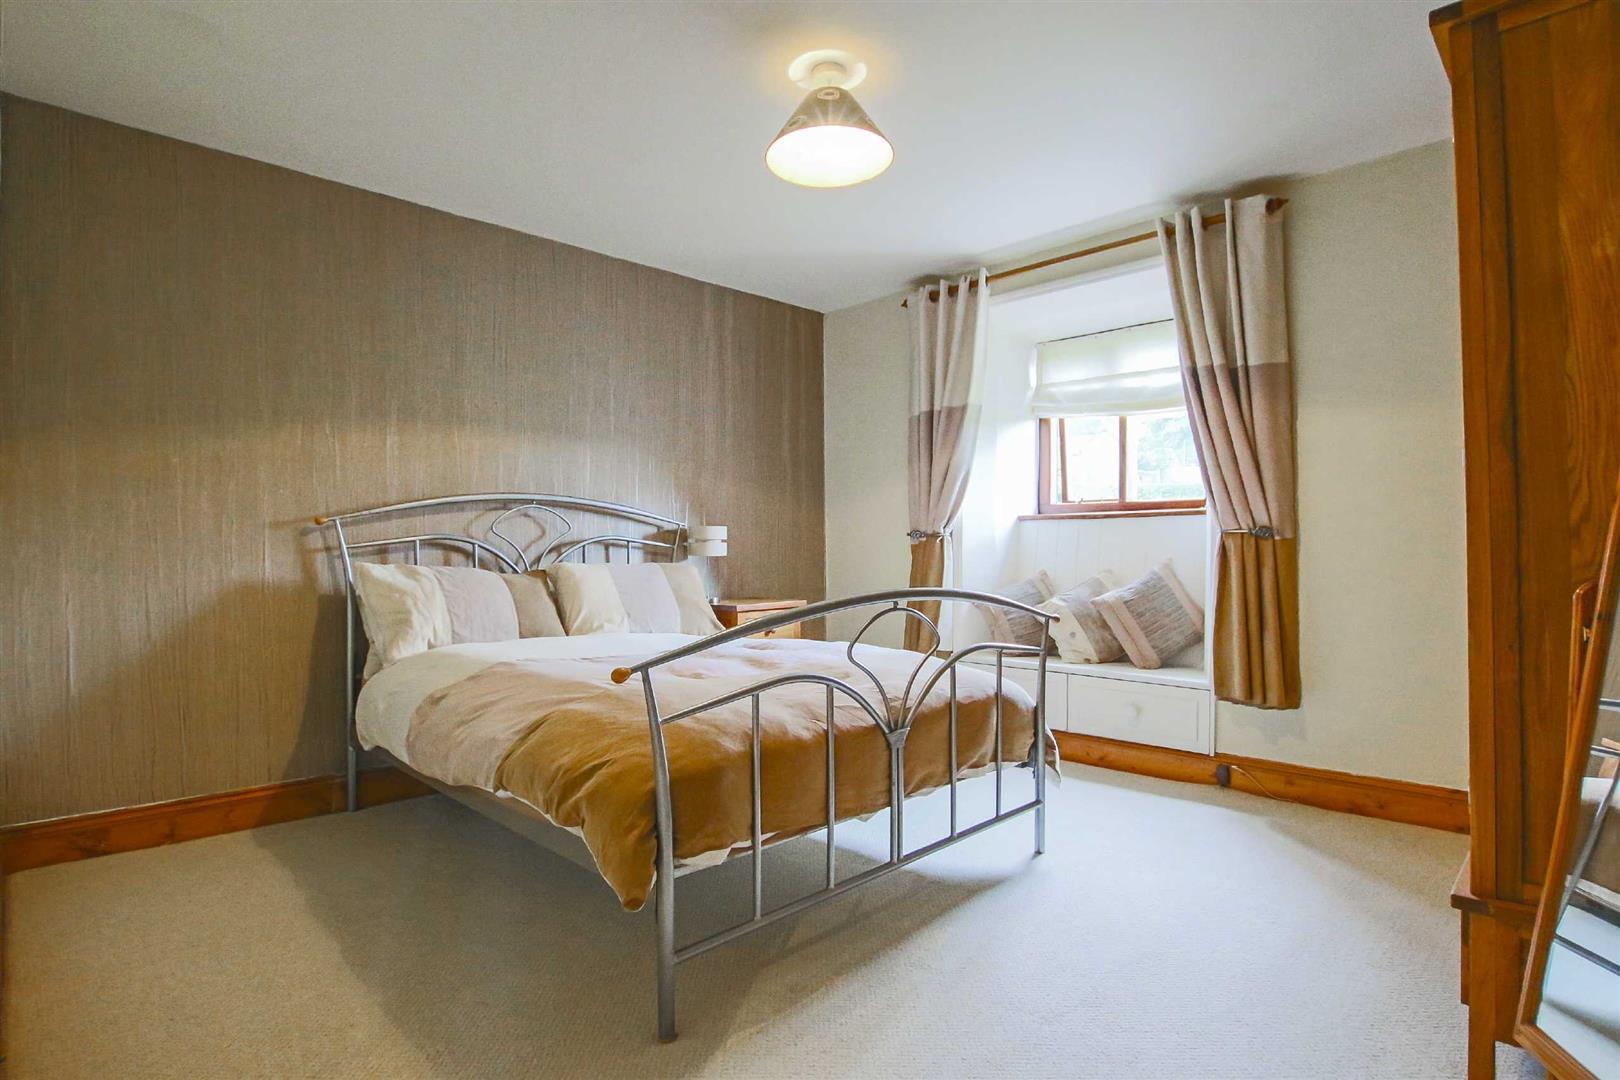 5 Bedroom Barn Conversion For Sale - p026519_21.jpg